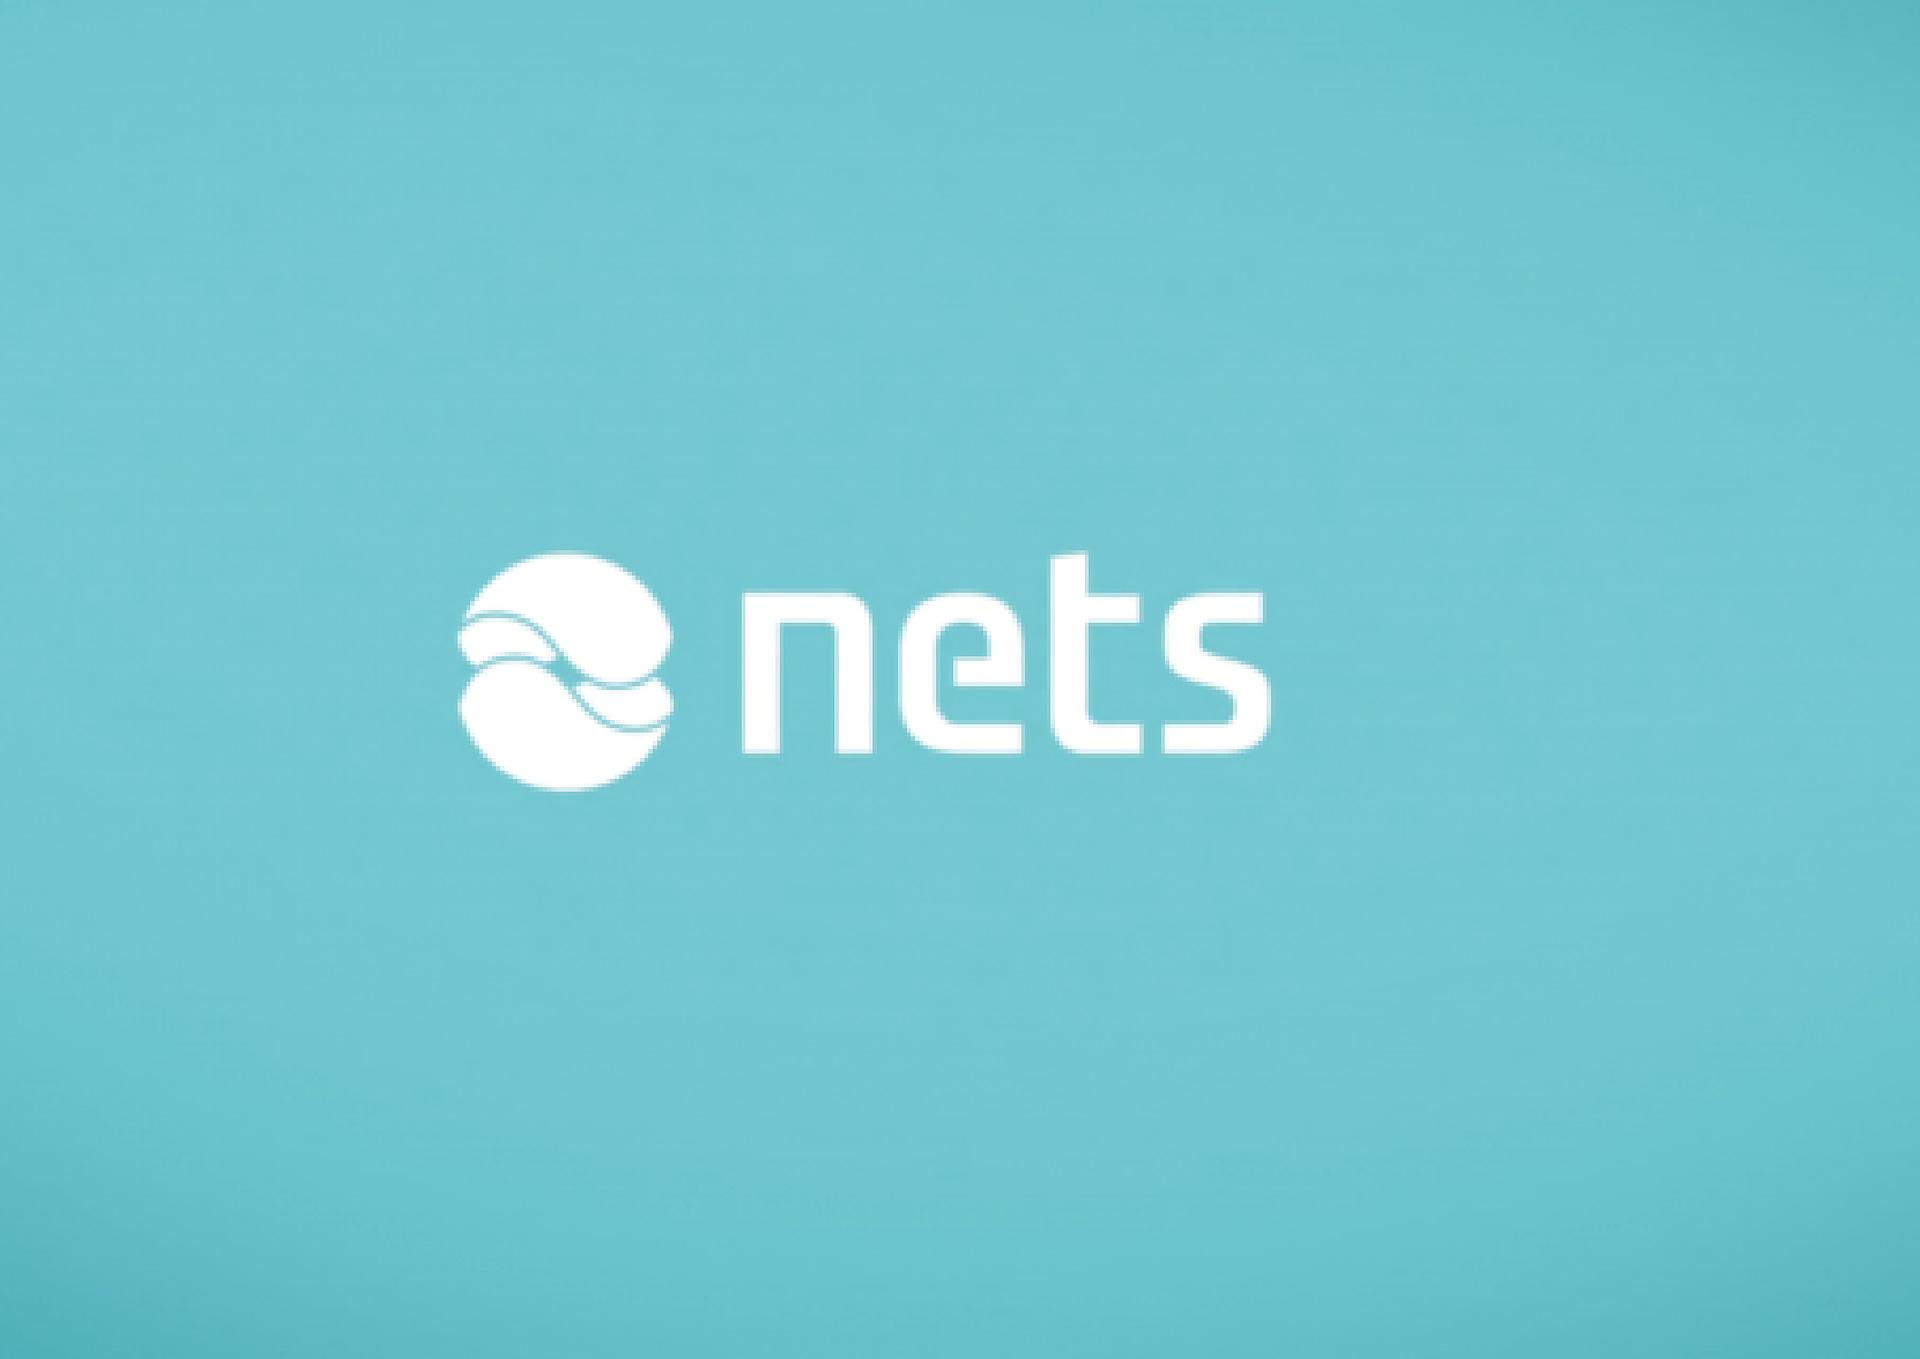 Nets animationsvideo